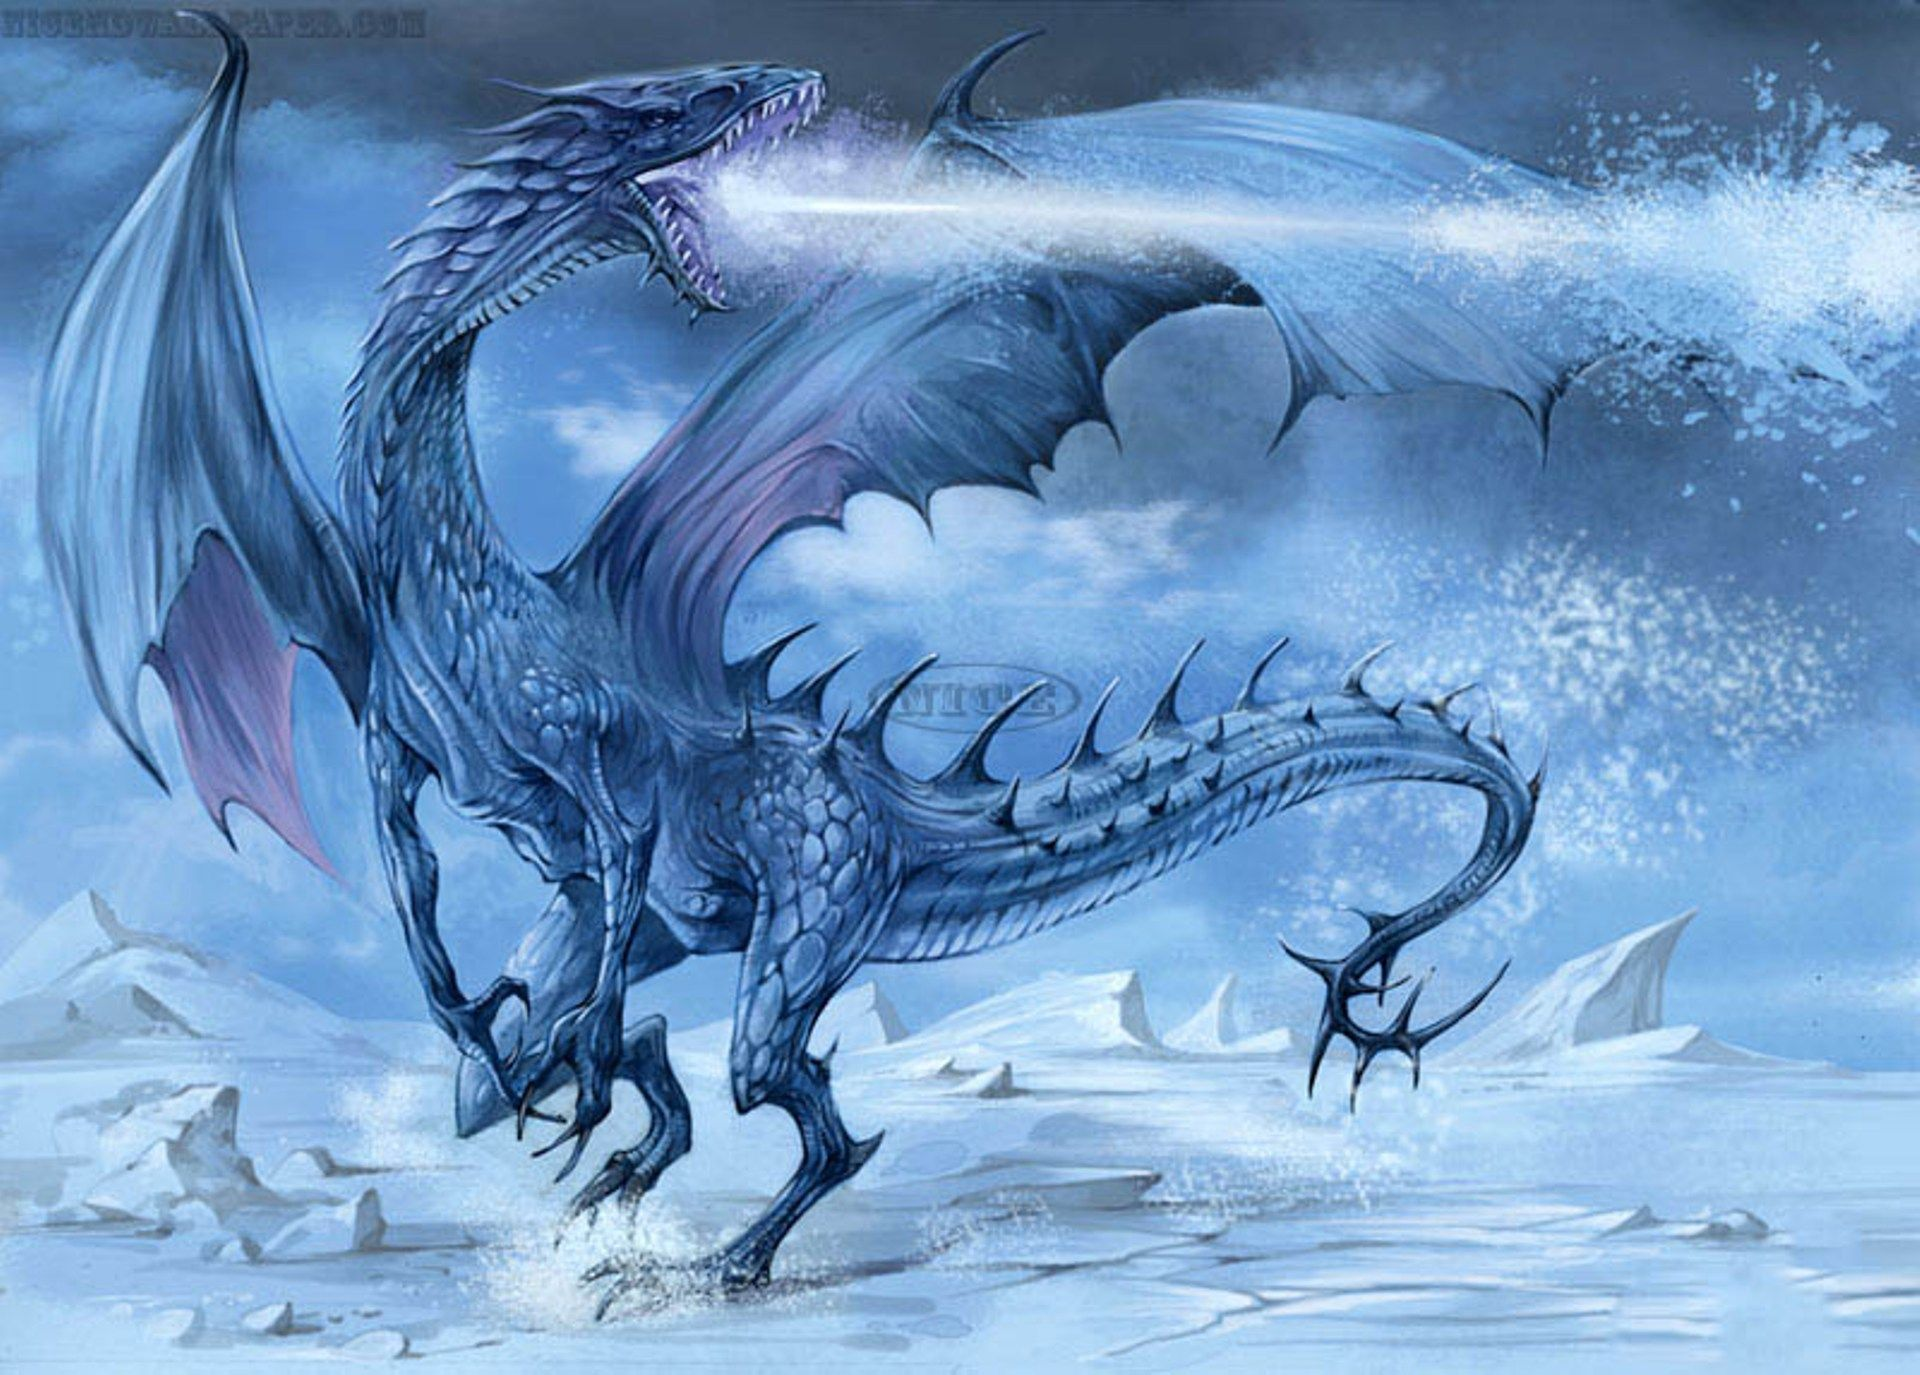 Fantasy Ice Dragons Wallpaper Cool Hd Ice Dragon Fantasy Dragon Cool Dragon Pictures